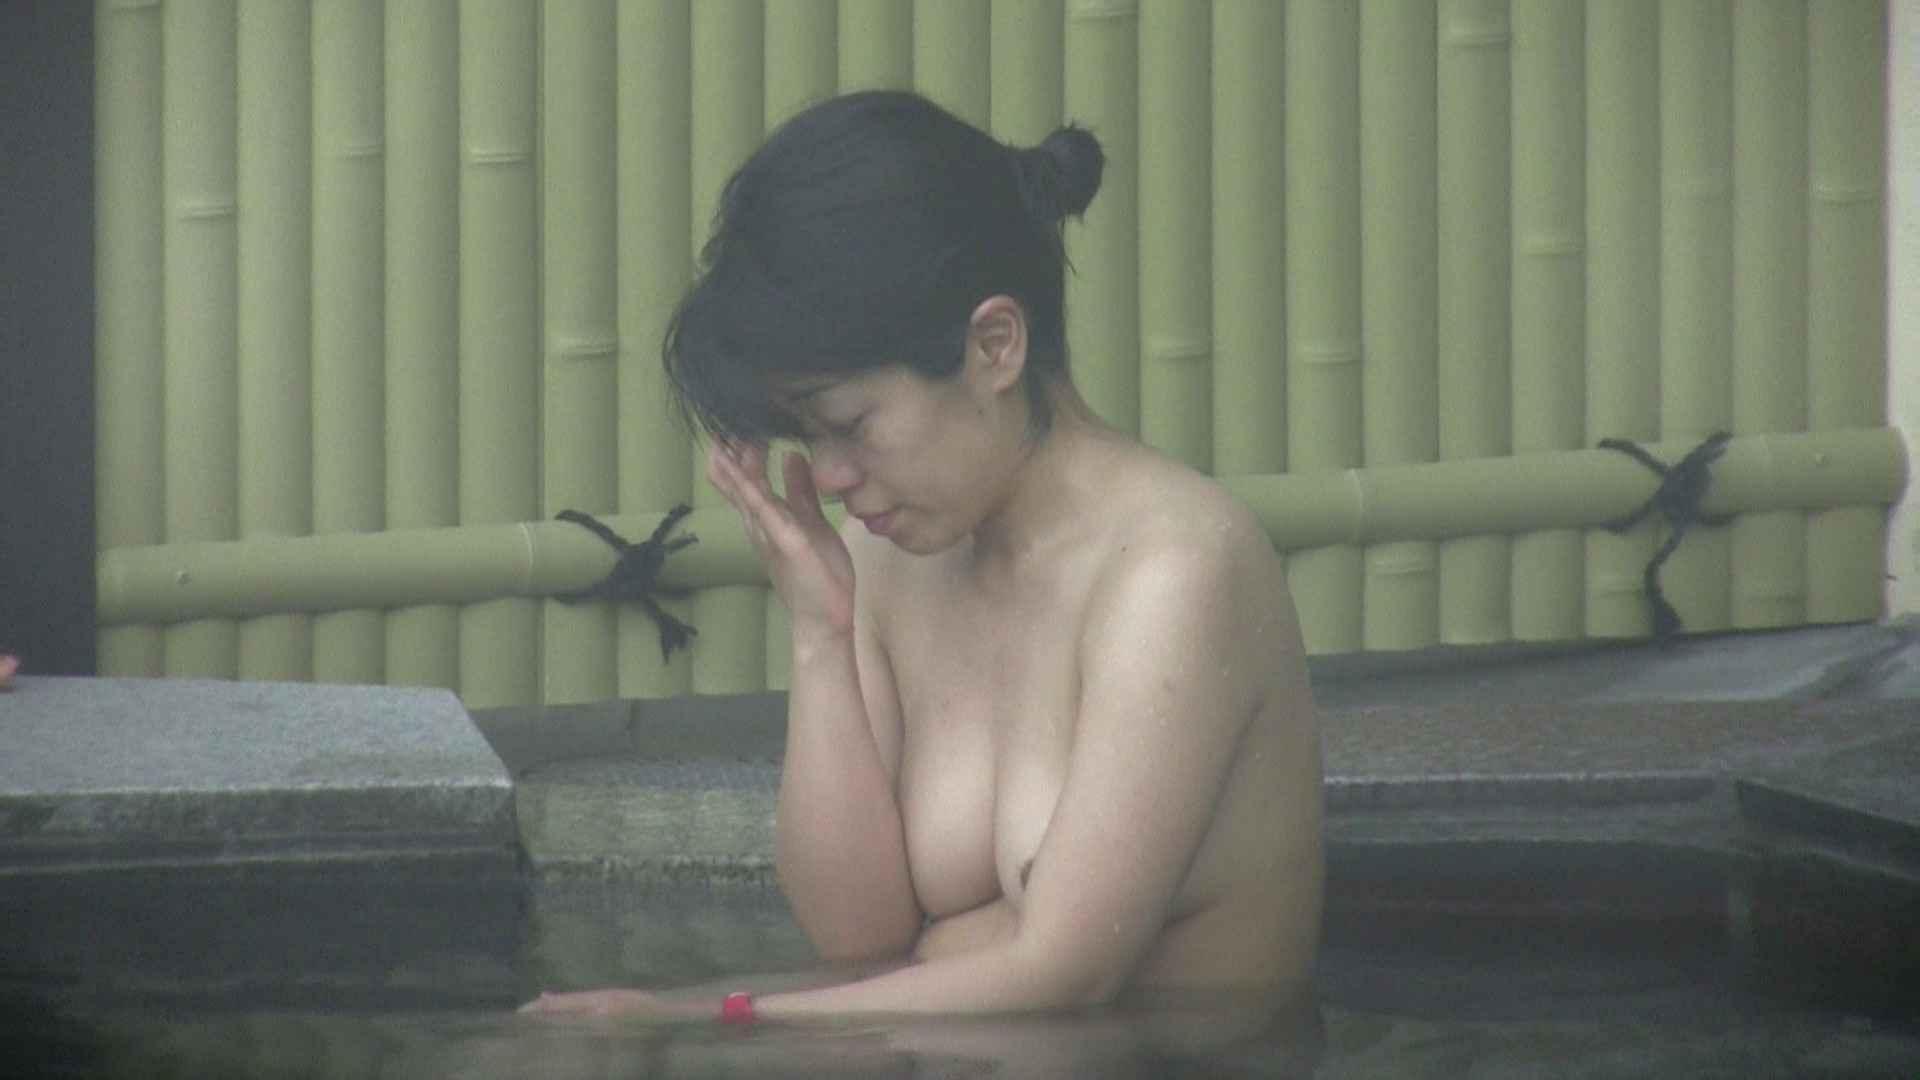 Aquaな露天風呂Vol.585 HなOL | 盗撮  93pic 52